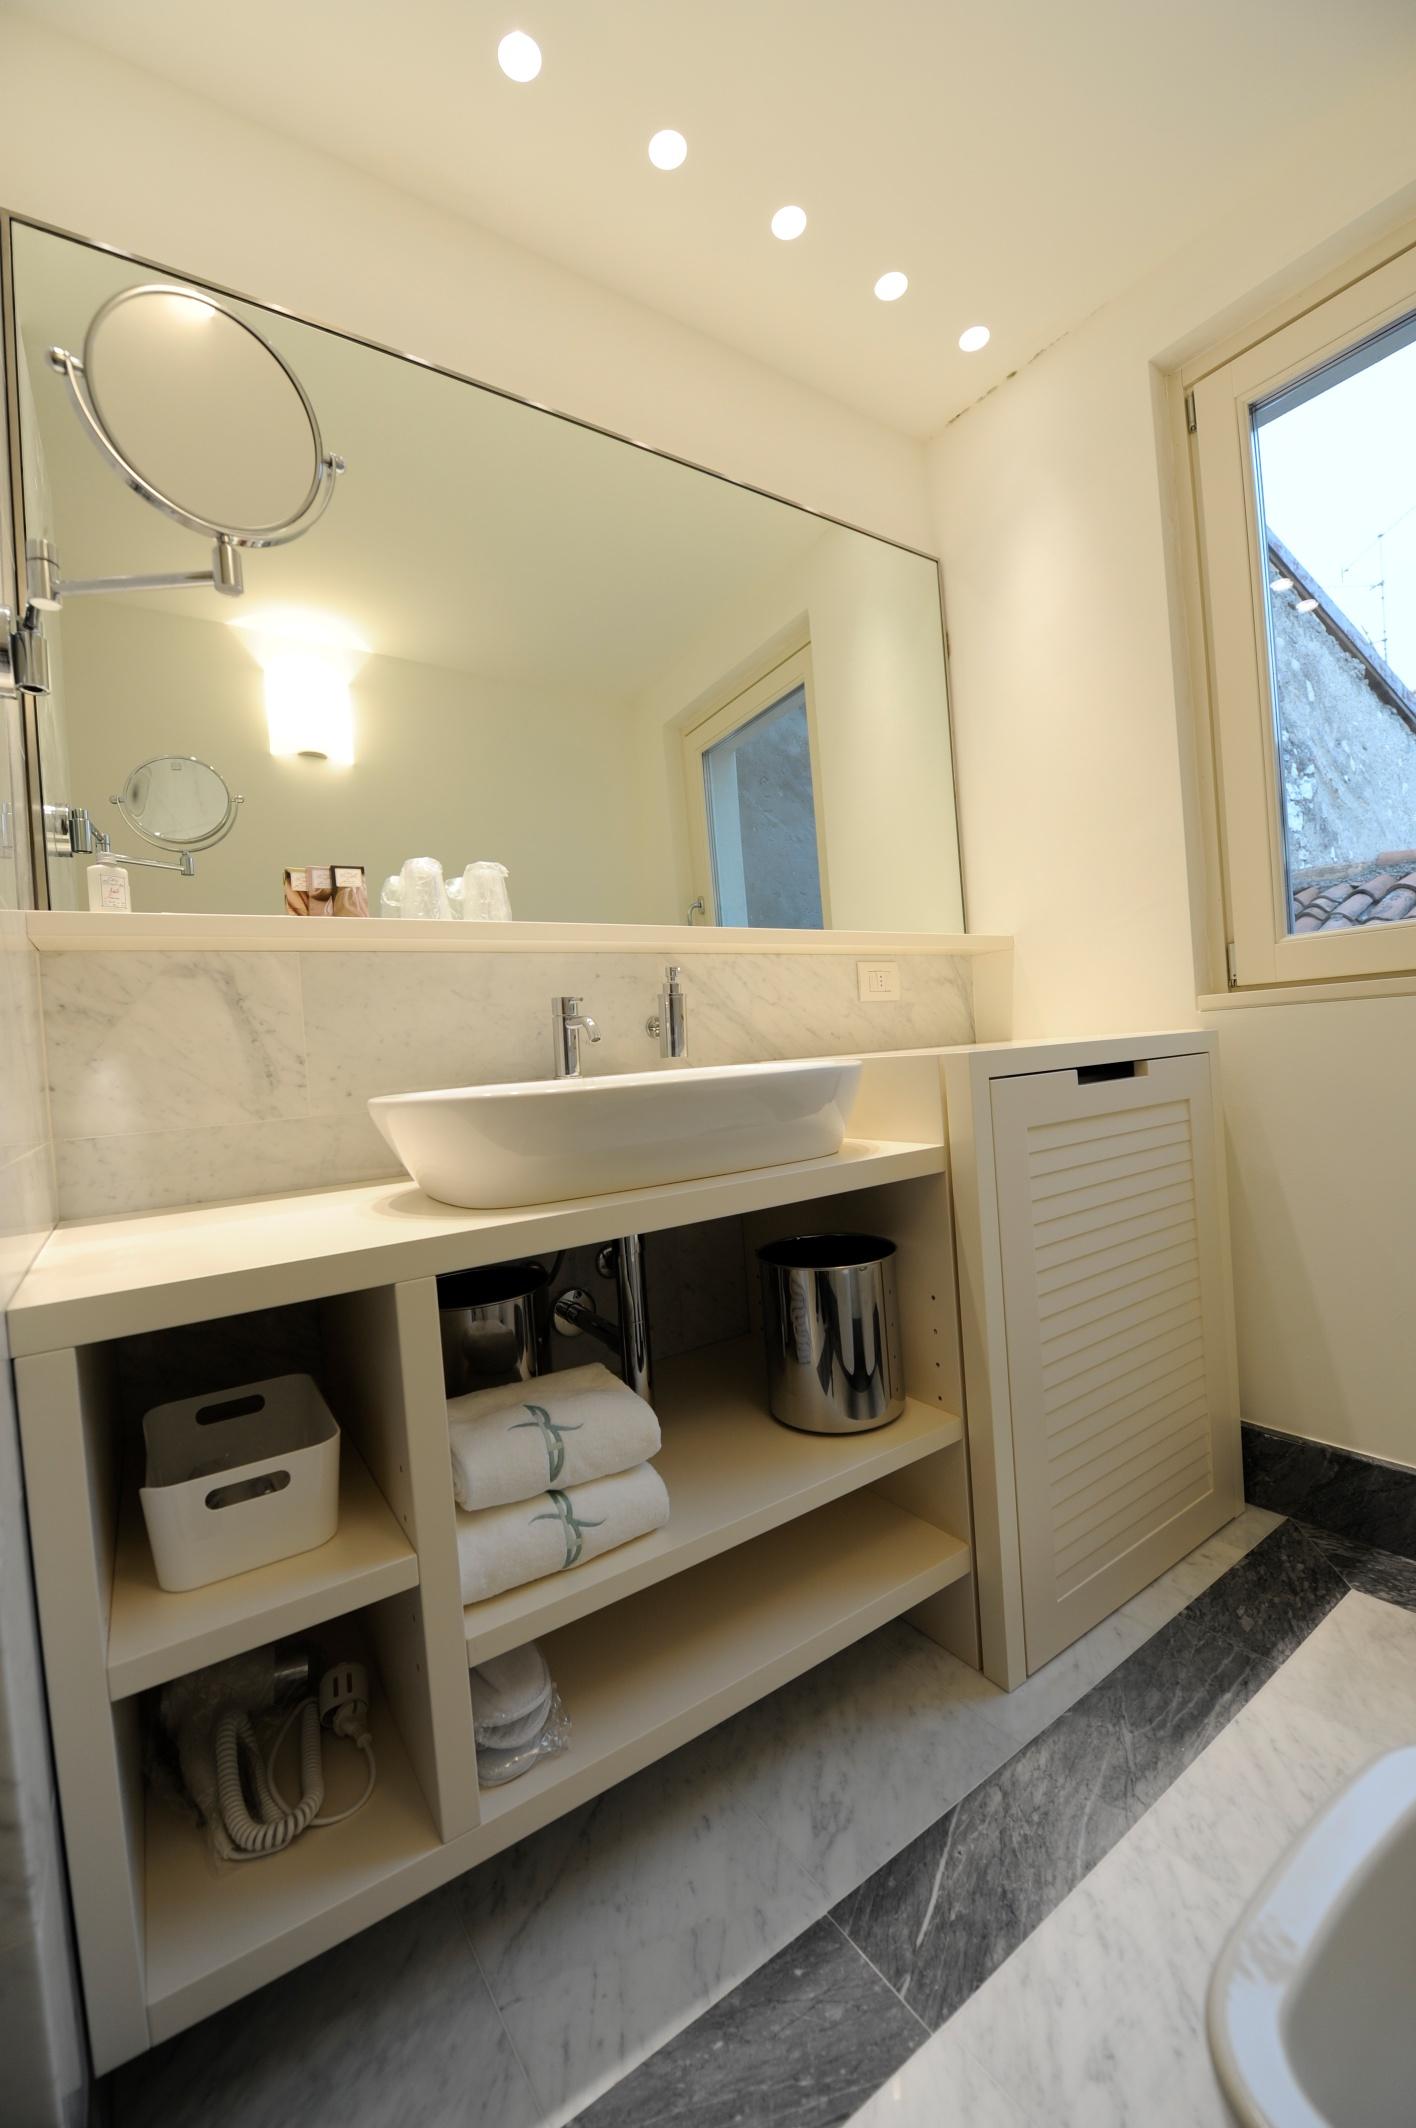 Aparthotel casa vacanze suite boutique hotel iseo - Mobile bagno lavatrice incasso ...